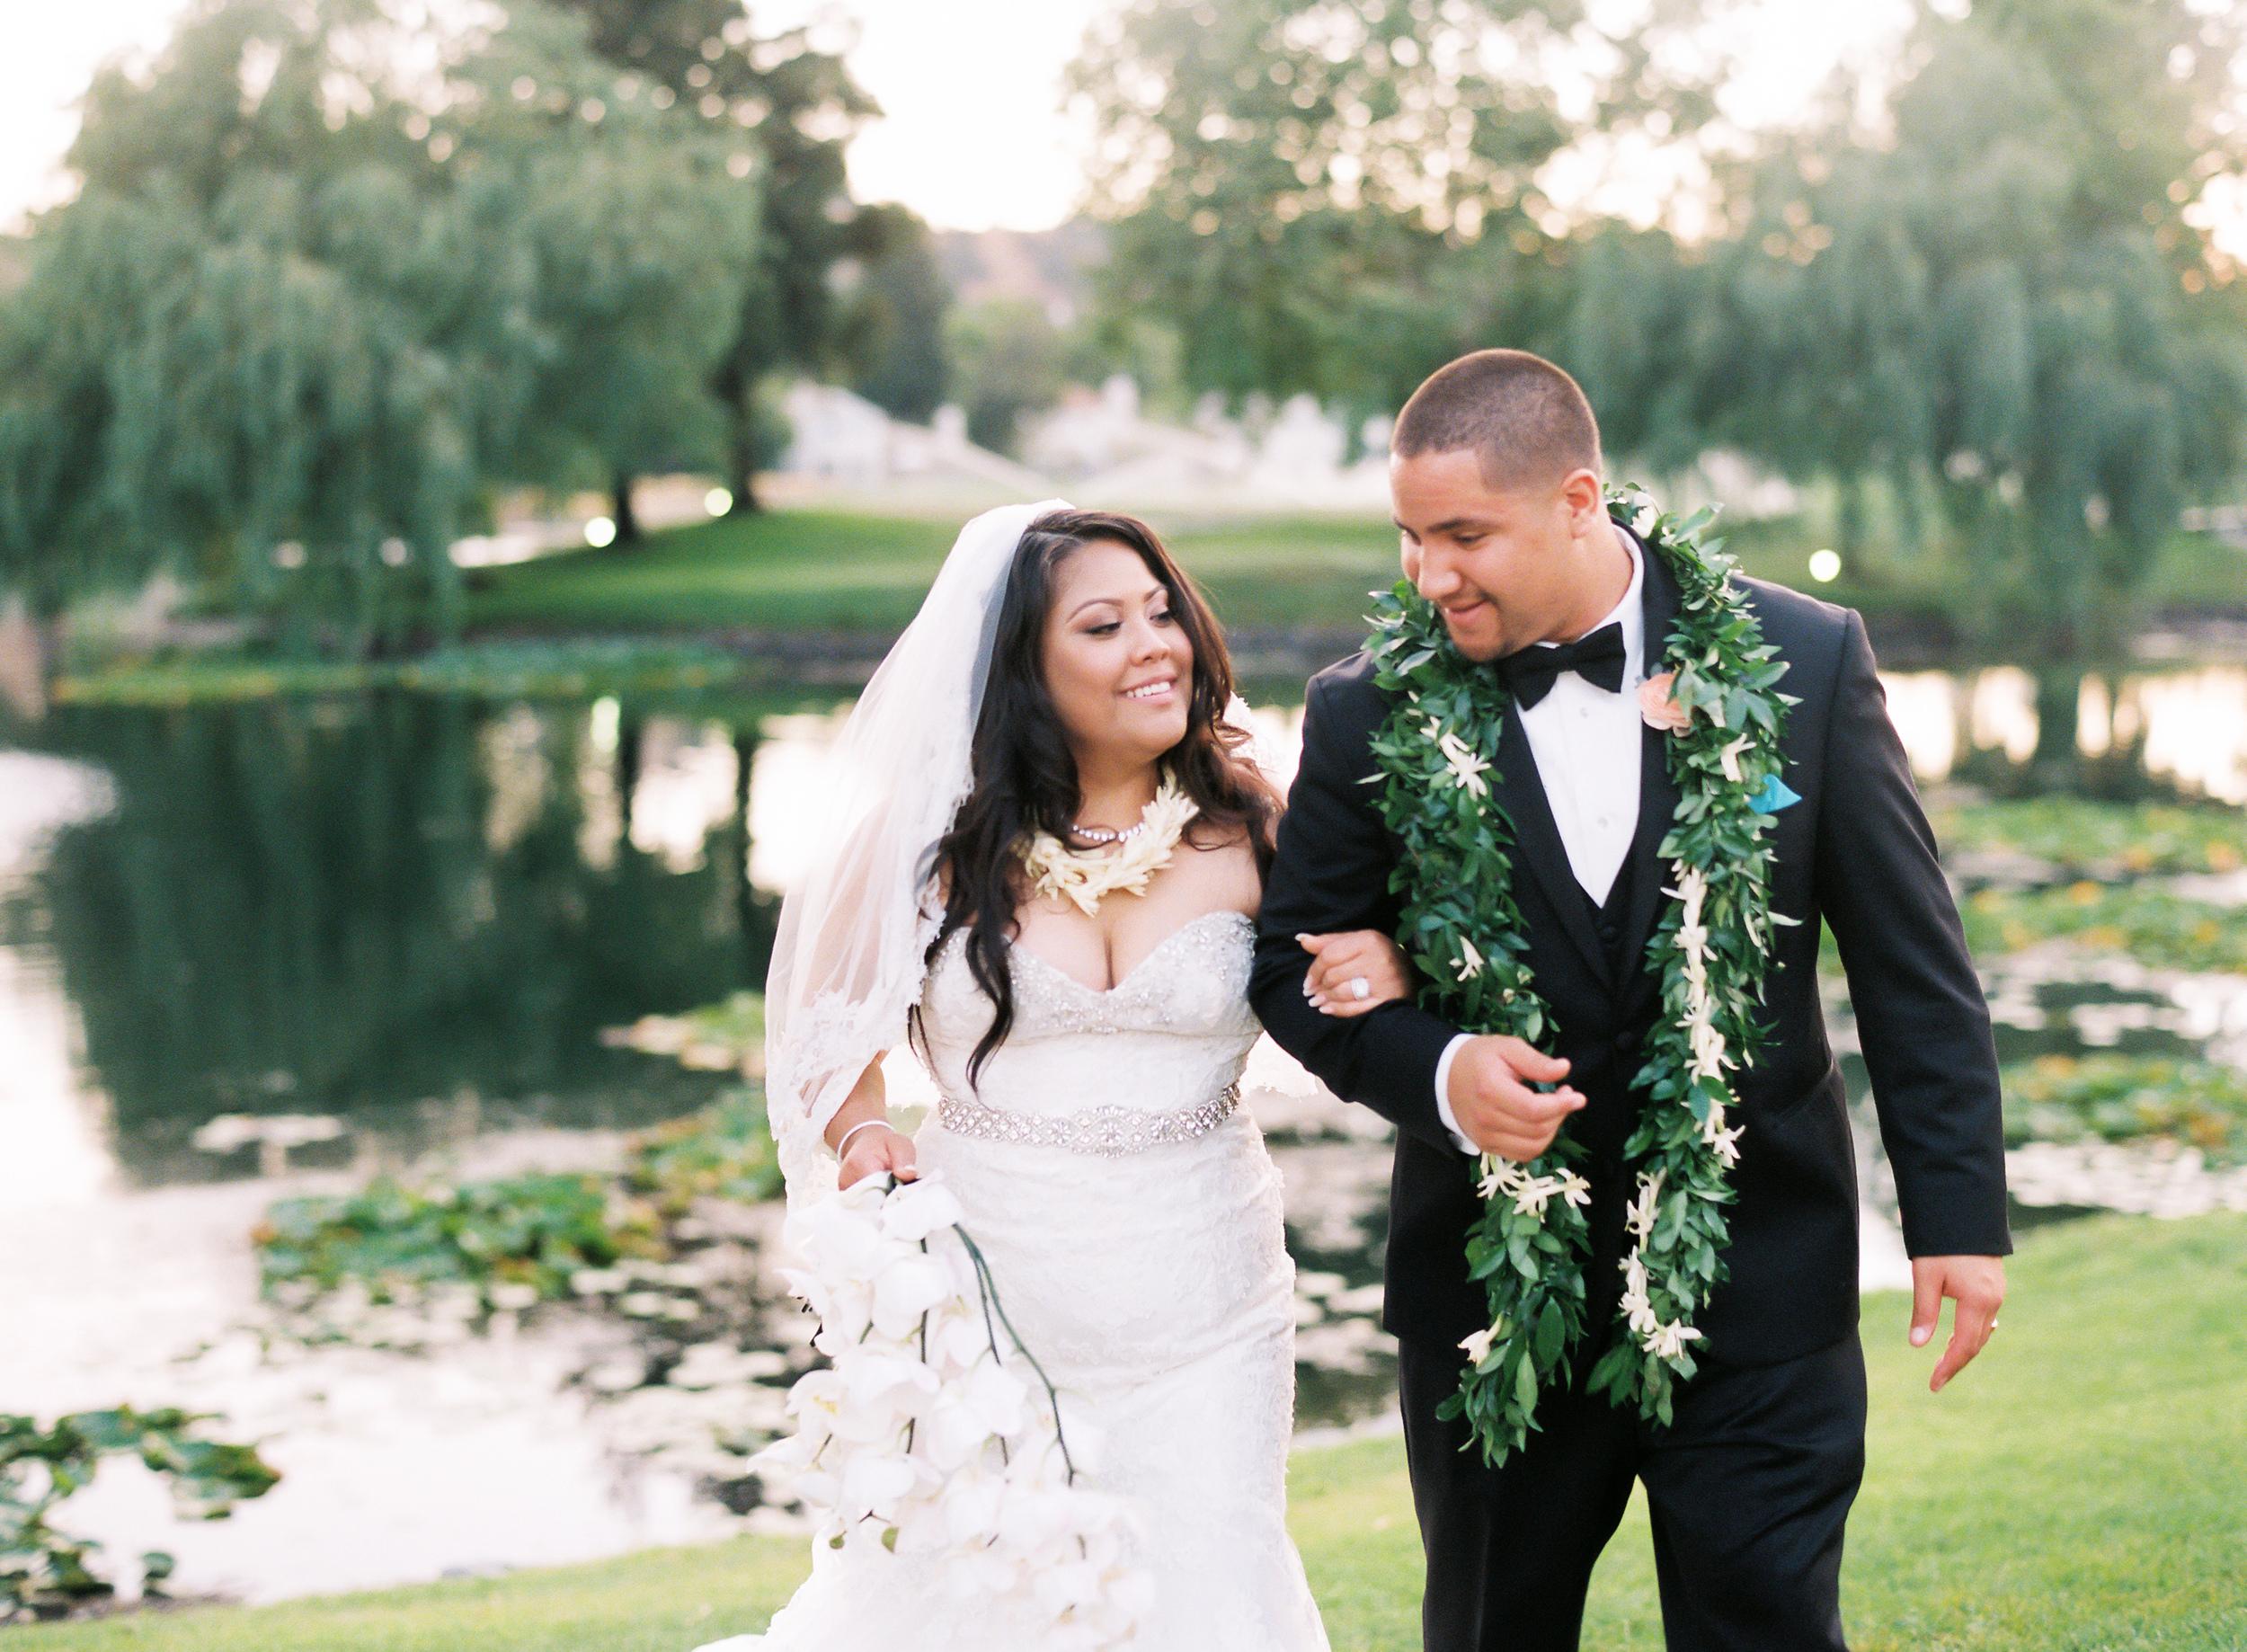 hawaiian-inspired-wedding-at-blackhawk-country-club-004.jpg